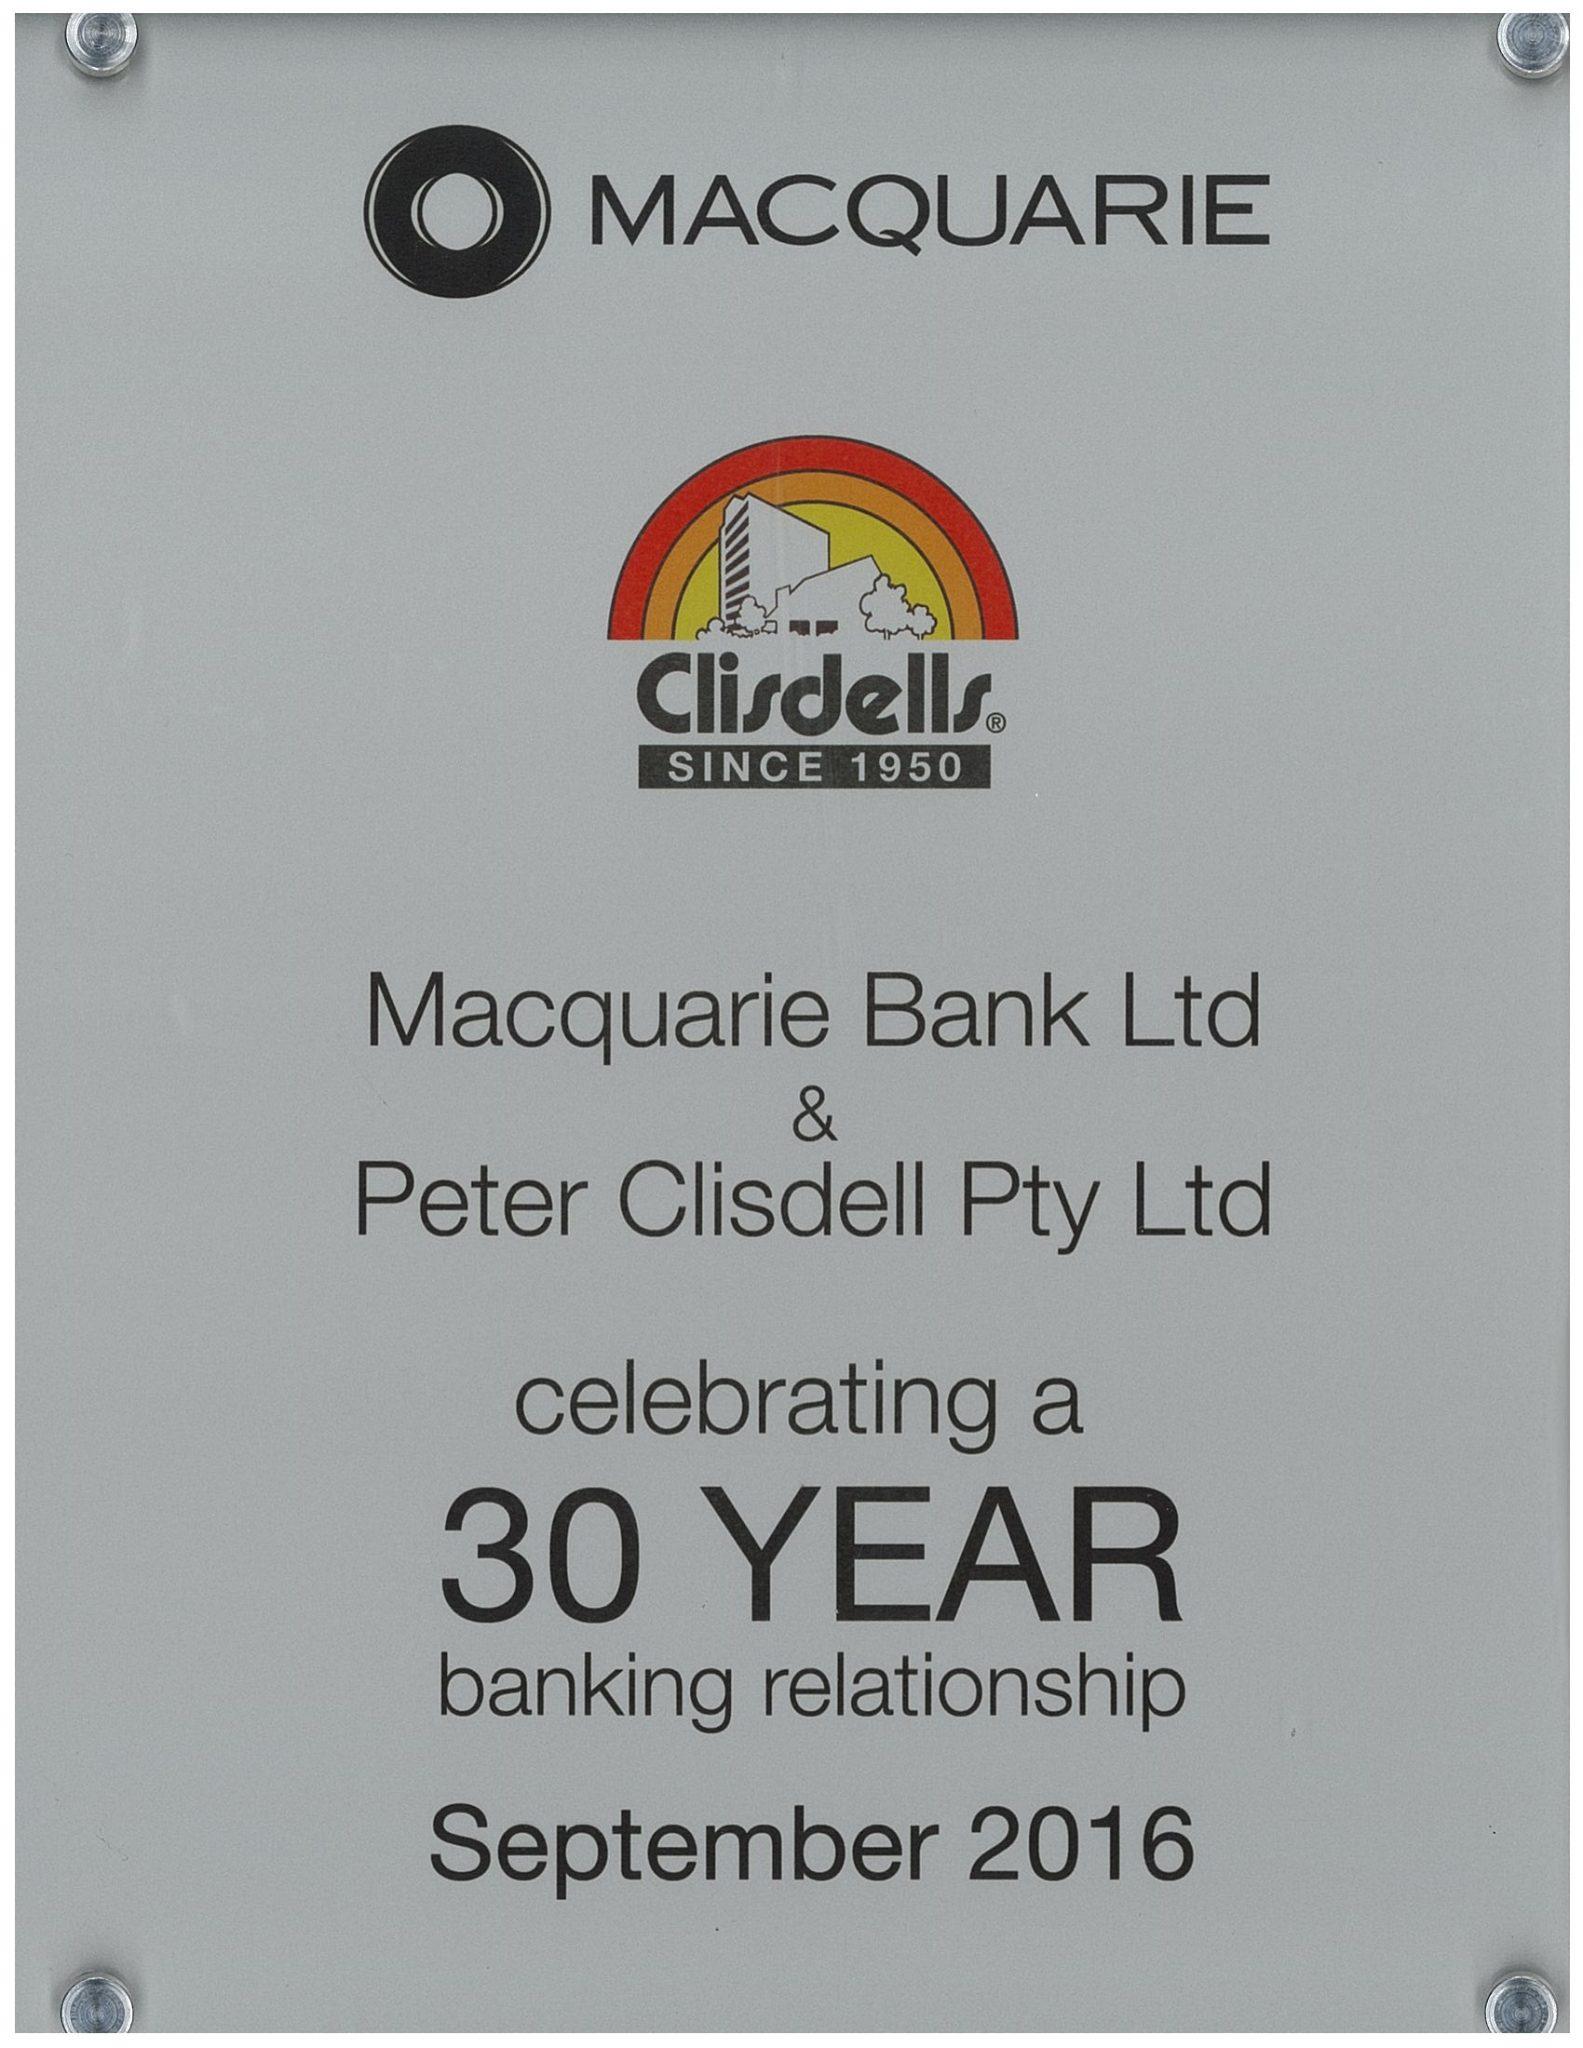 Clisdells & Macquarie Bank celebrating 30 years